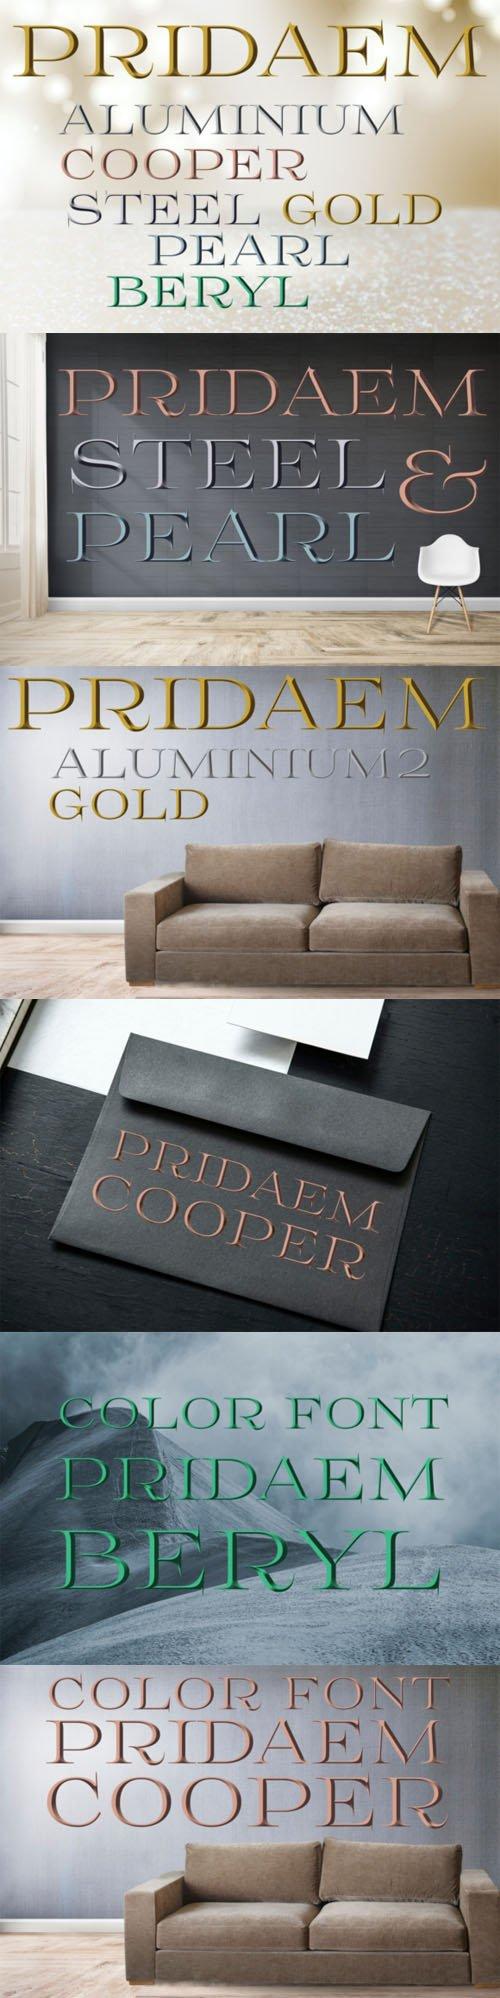 PridaEm - Elegant Color Font [7-Weights]